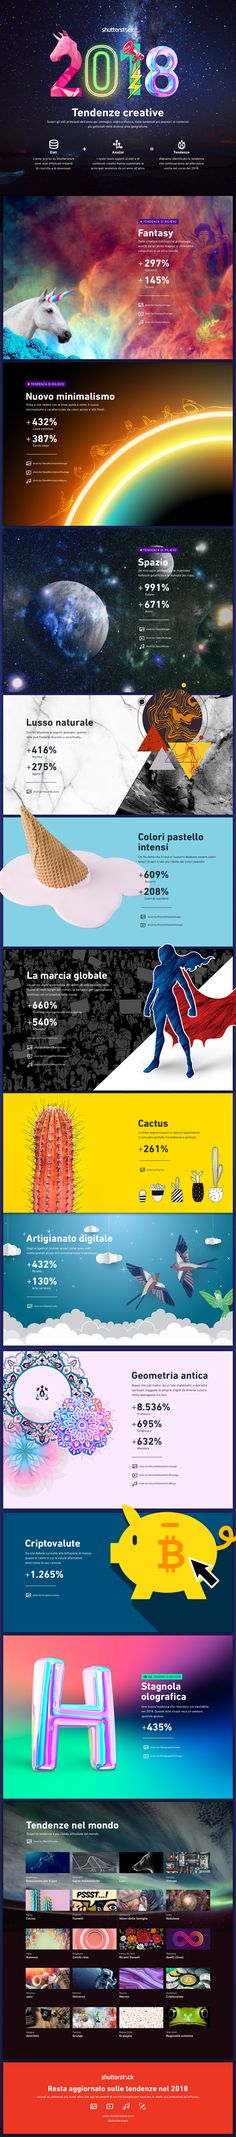 2018 Creative Trends Italian Infographic